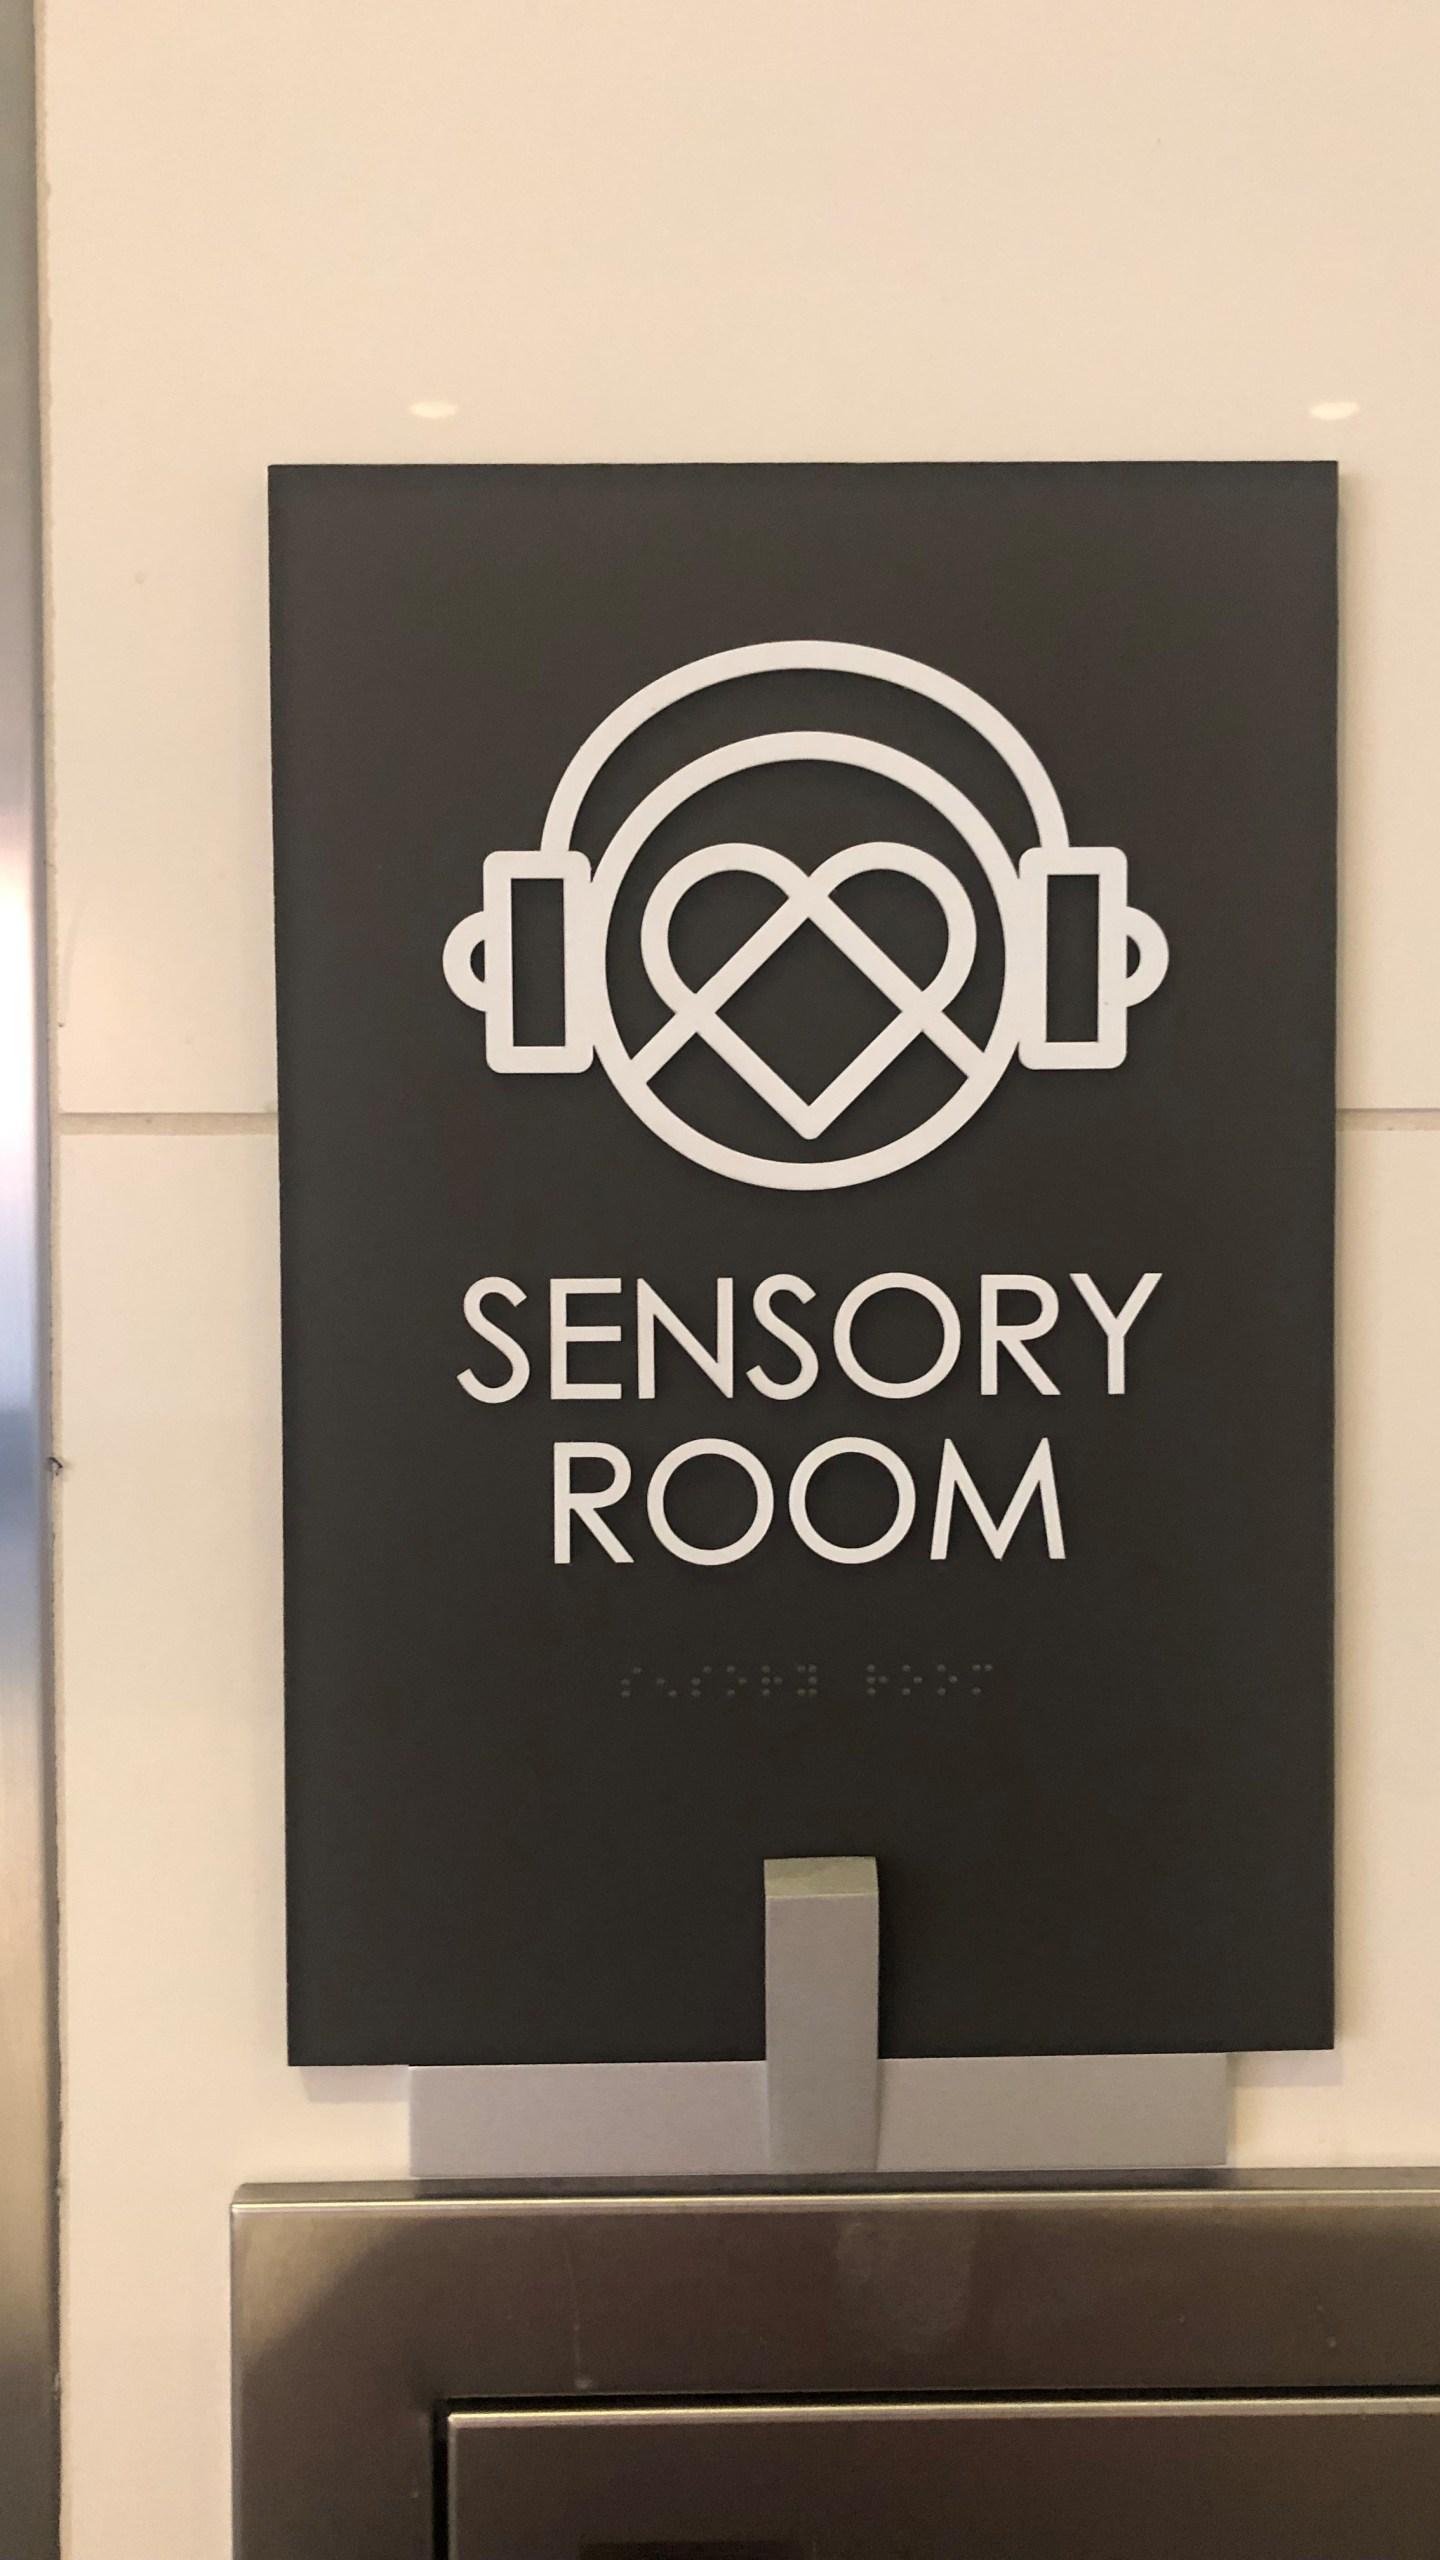 BHM Sensory Room 6_1550260948891.jpg.jpg